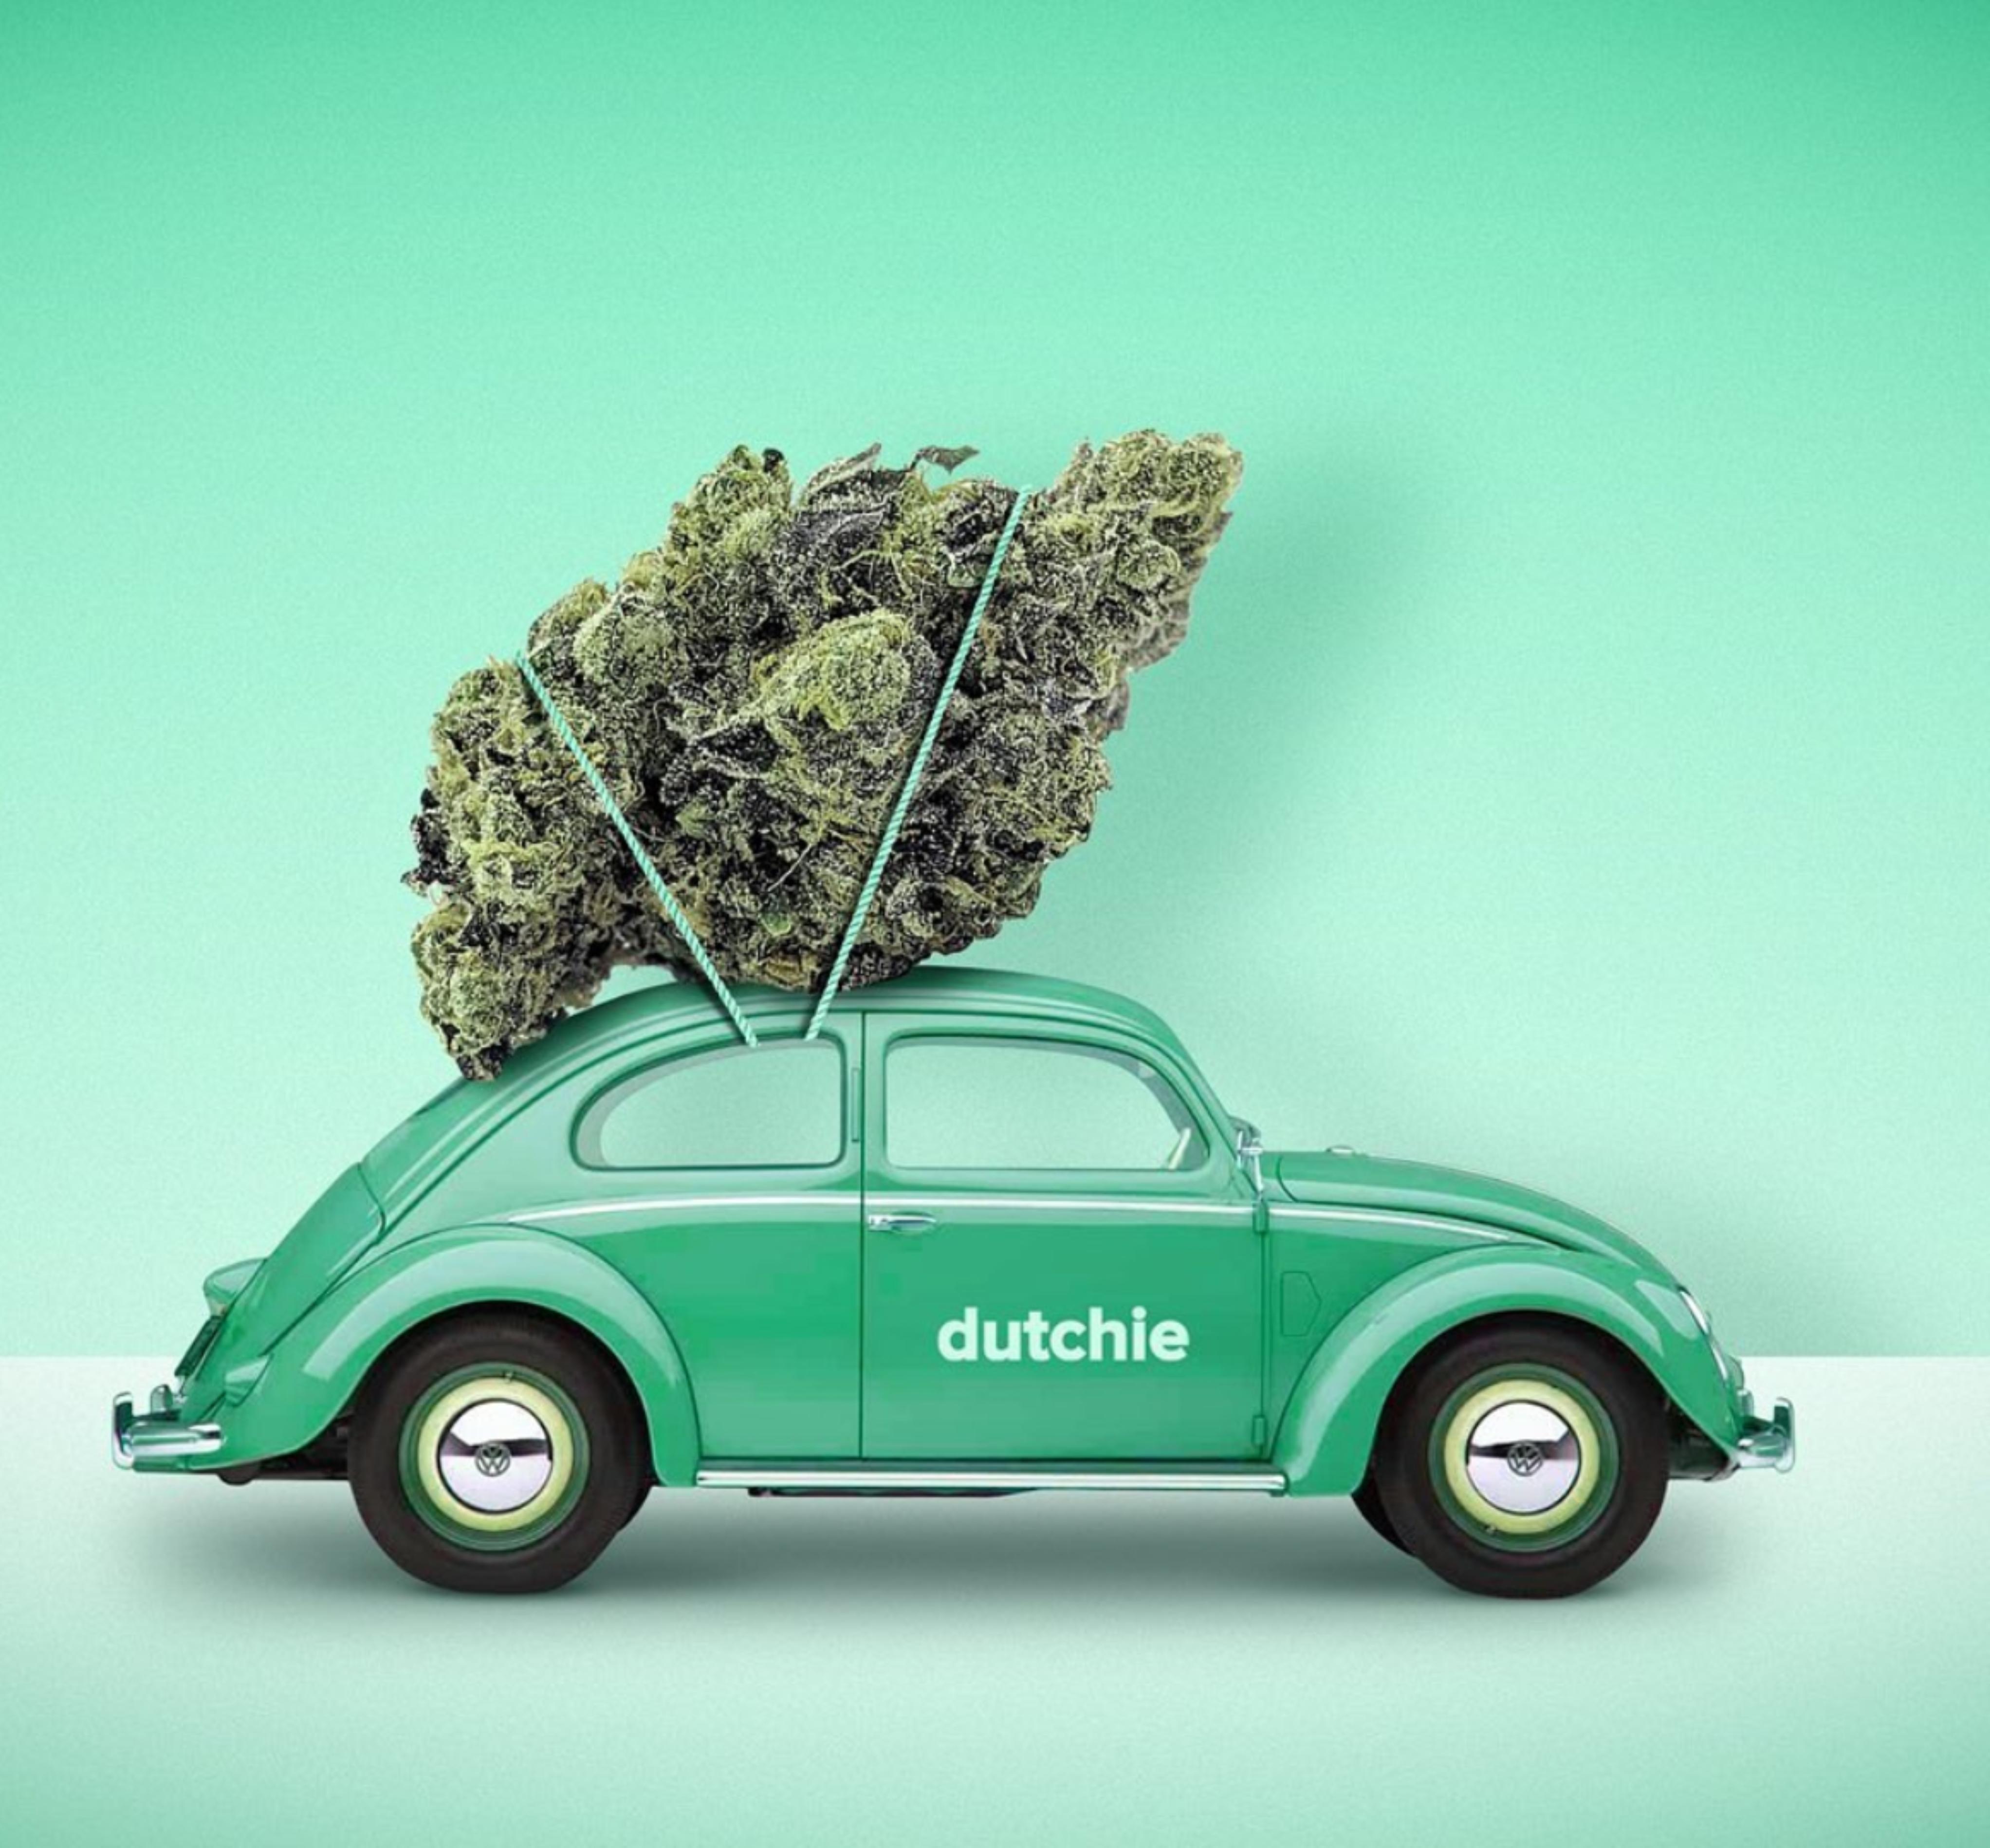 Dutchie car and marijuana